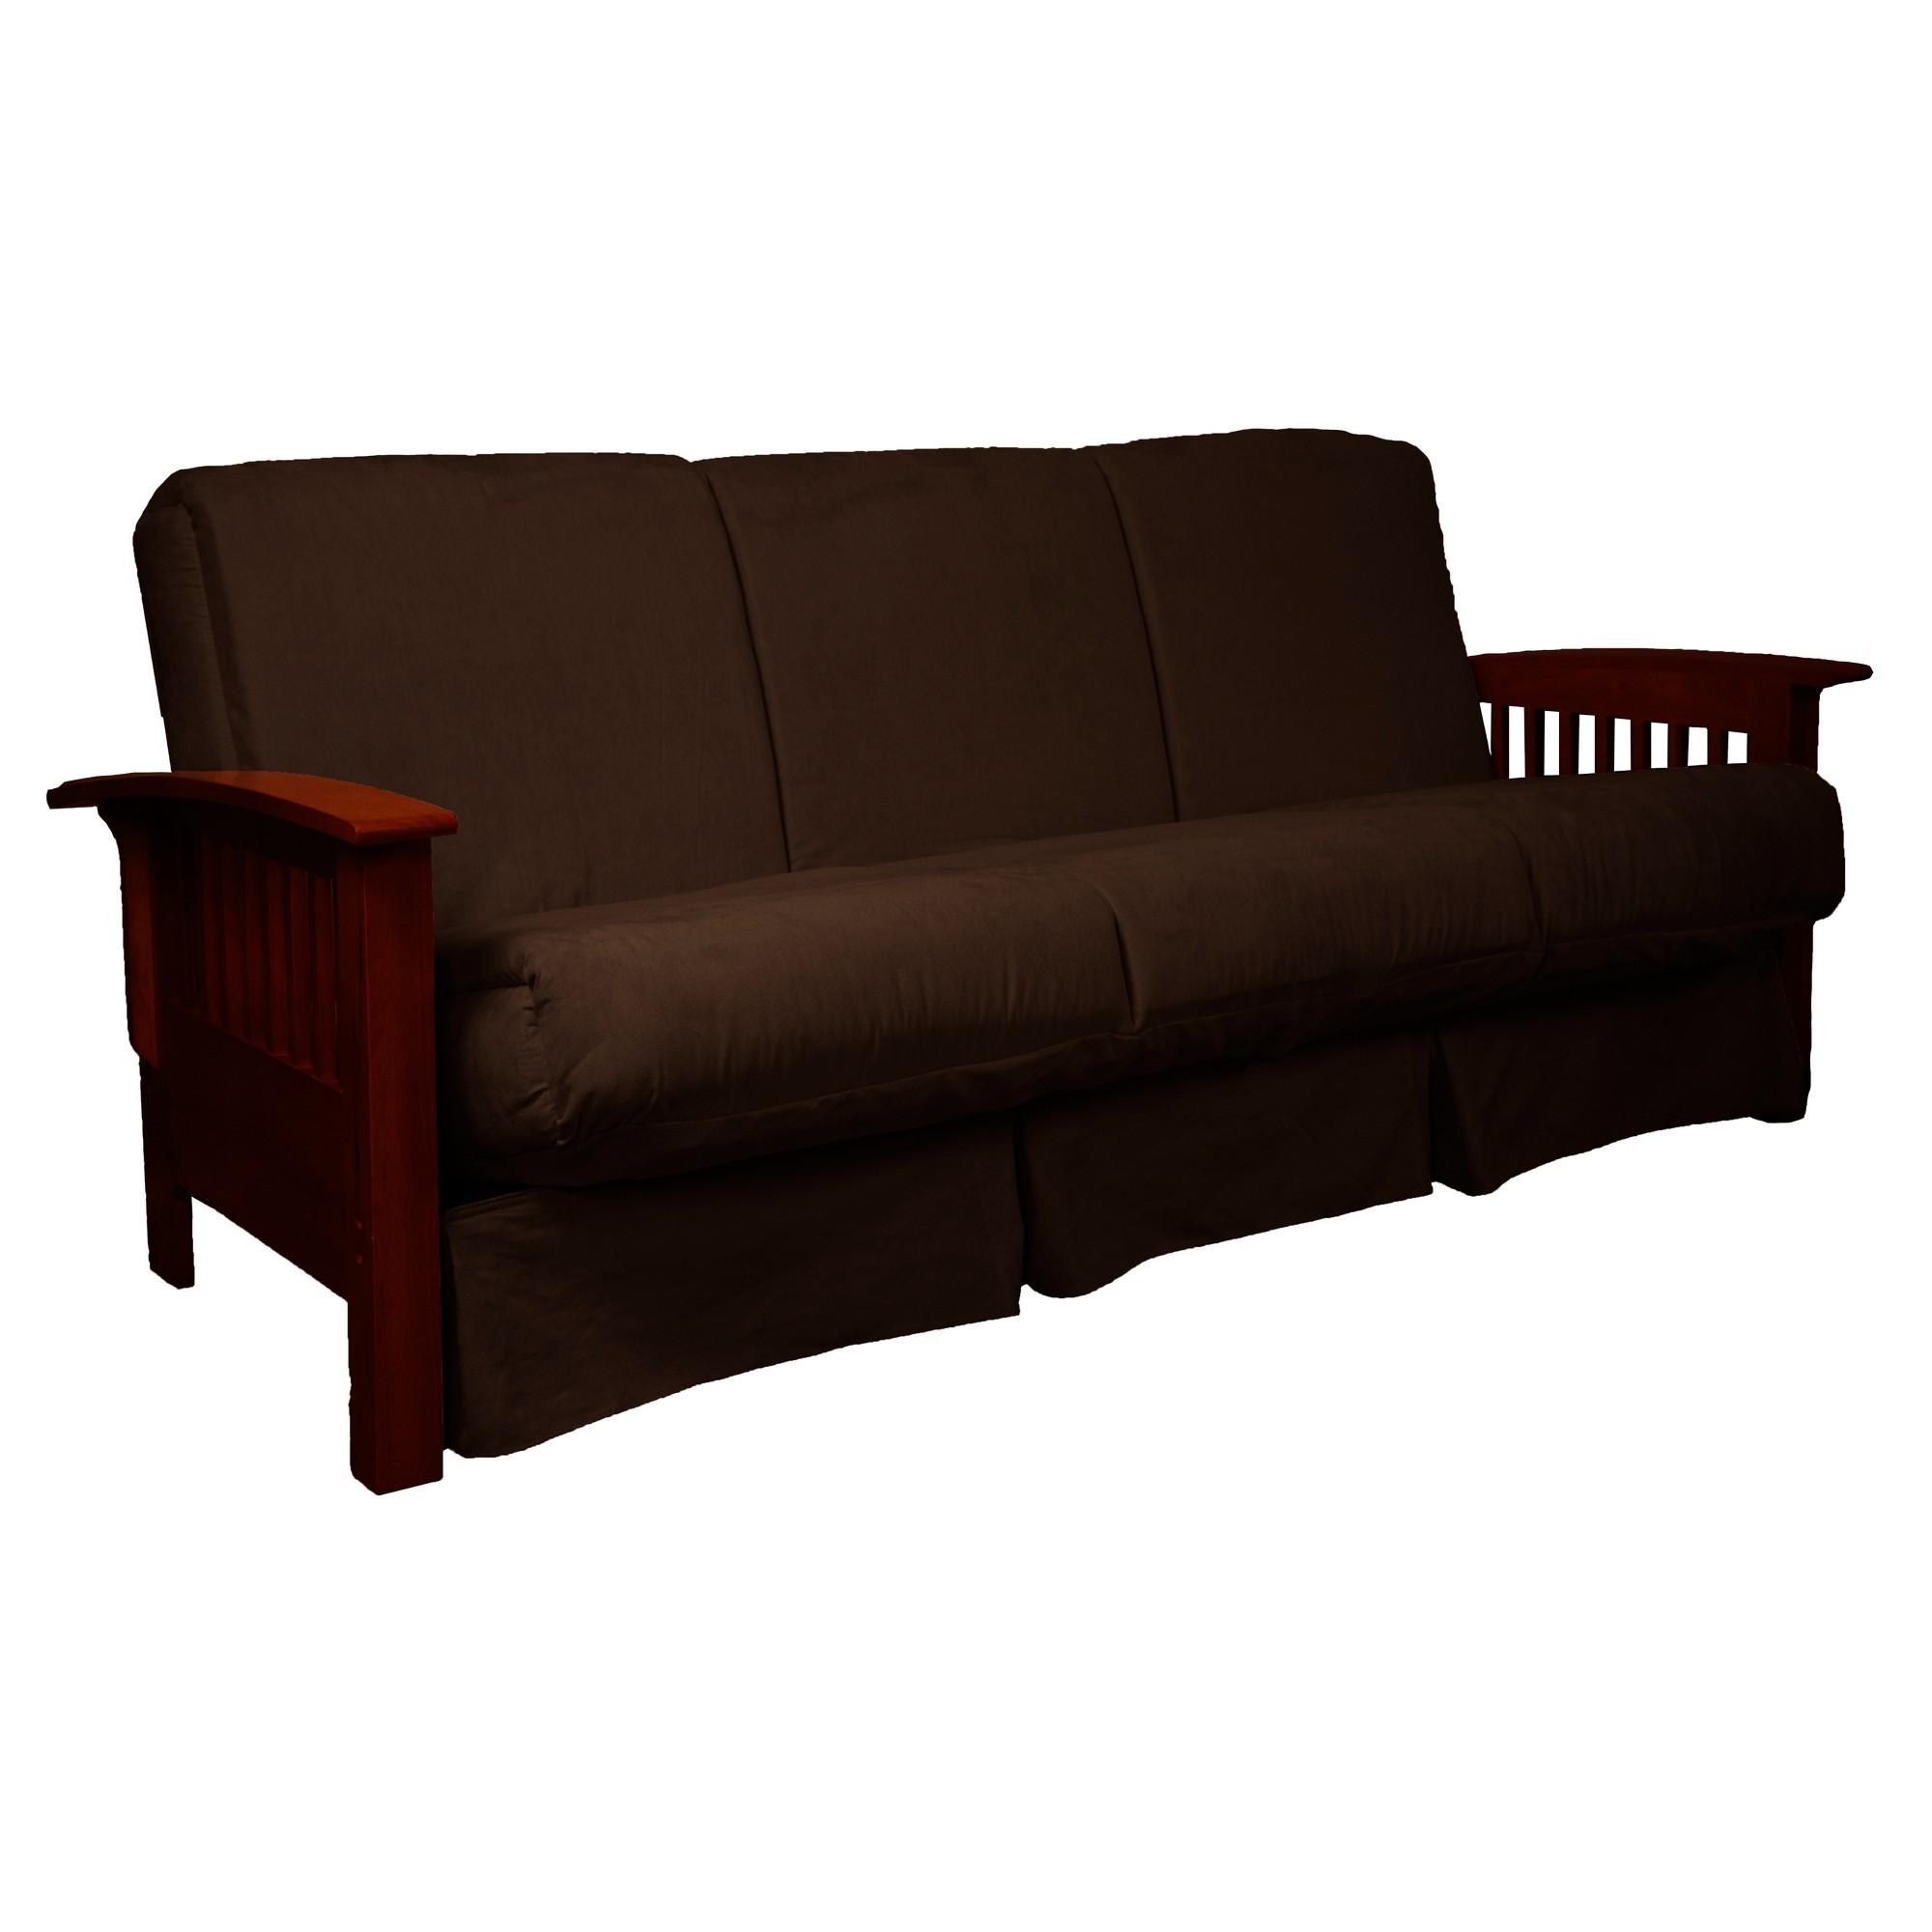 Stickley Perfect Futon Sofa Sleeper Mahogany Wood Finish Mocha Brown Upholstery Queen